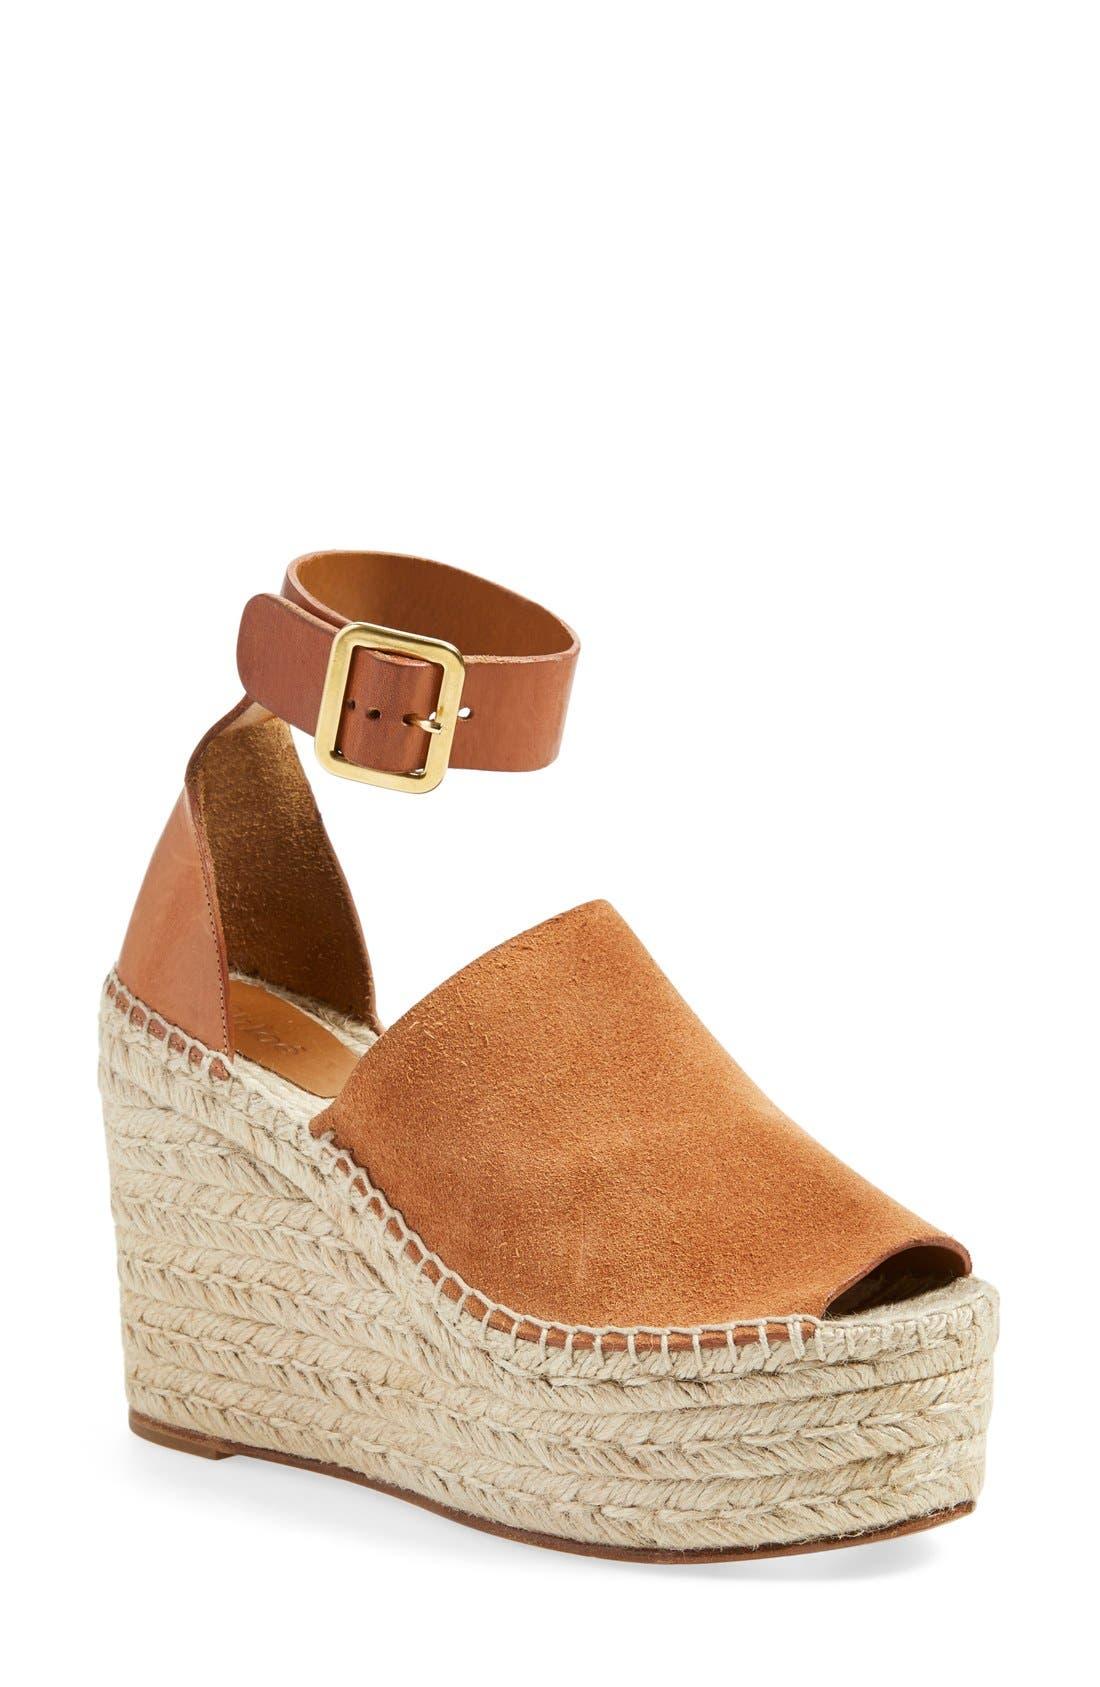 'Isa' Espadrille Wedge Sandal,                         Main,                         color, 200